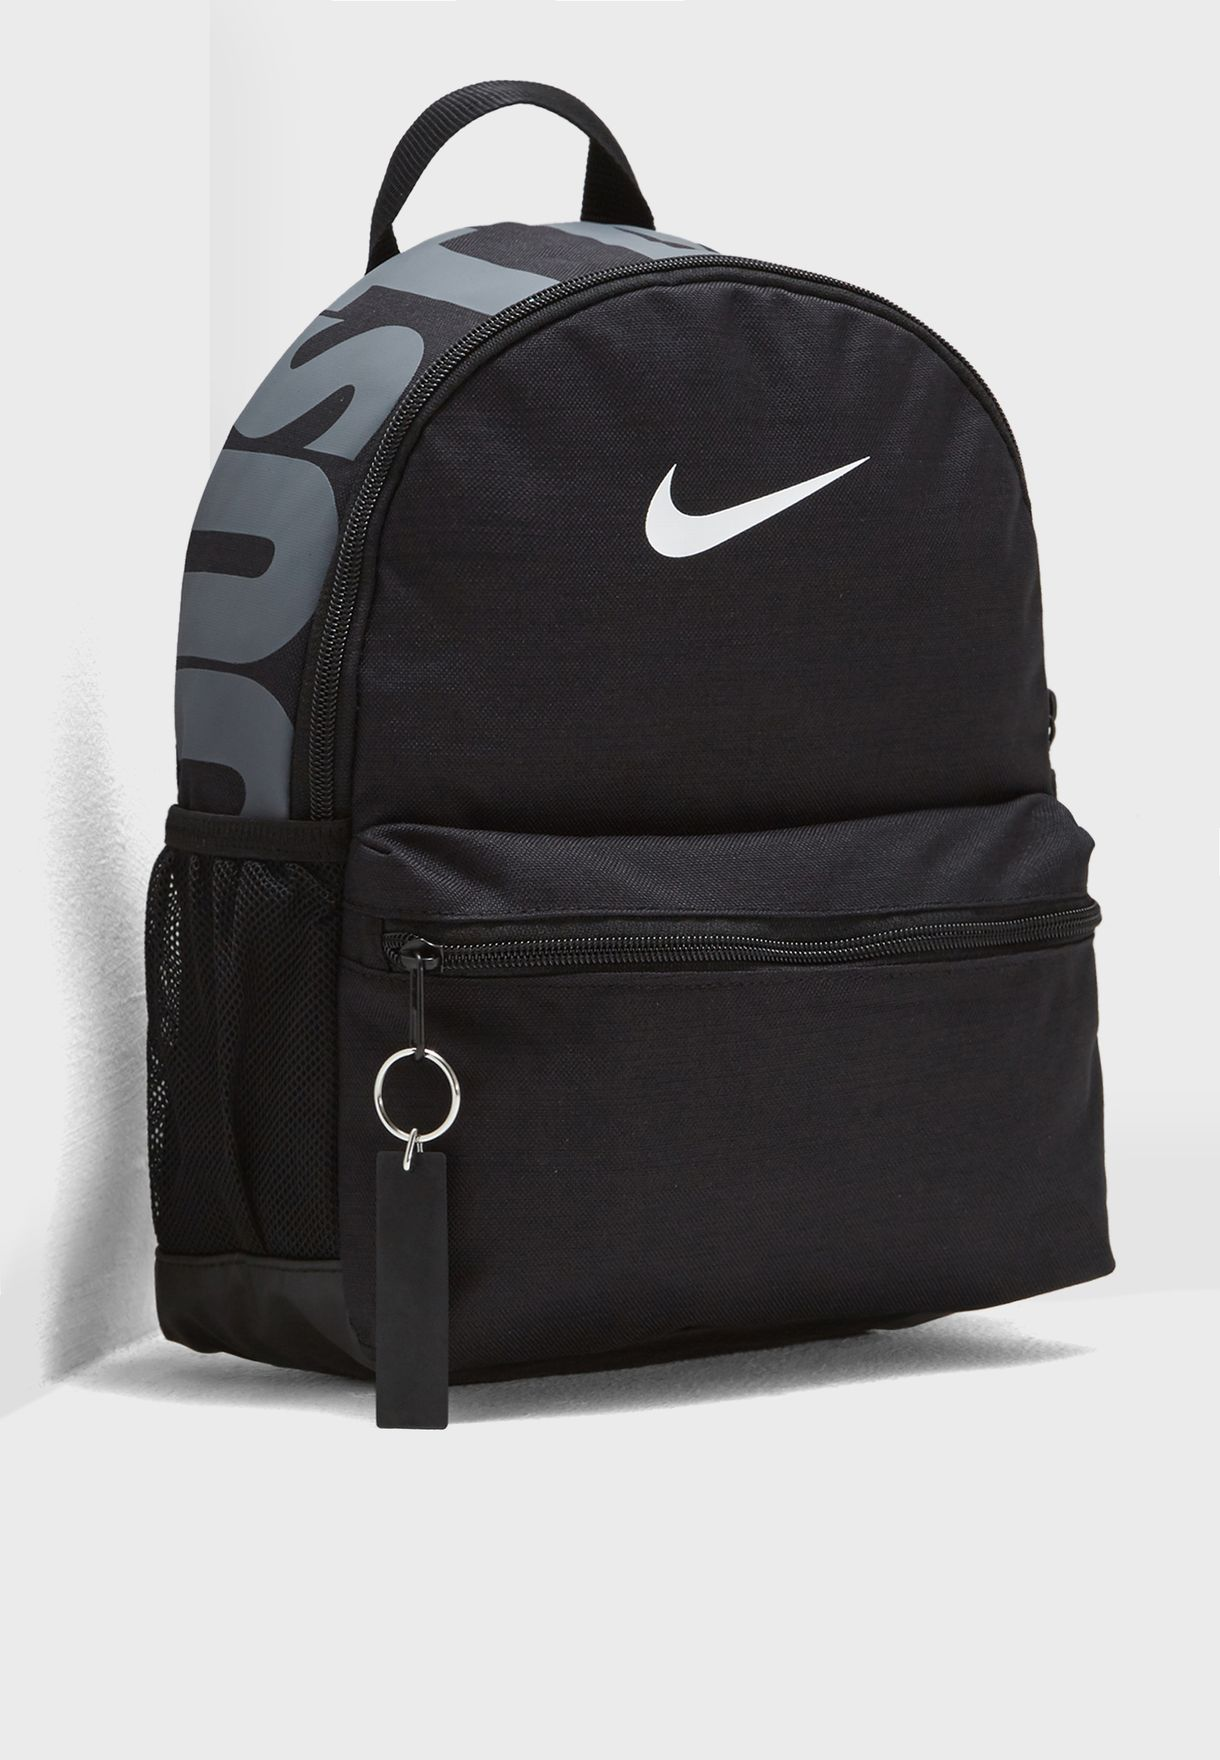 ea728e04c984 Shop Nike black Brasilia Just Do It Mini Backpack BA5559-010 for ...